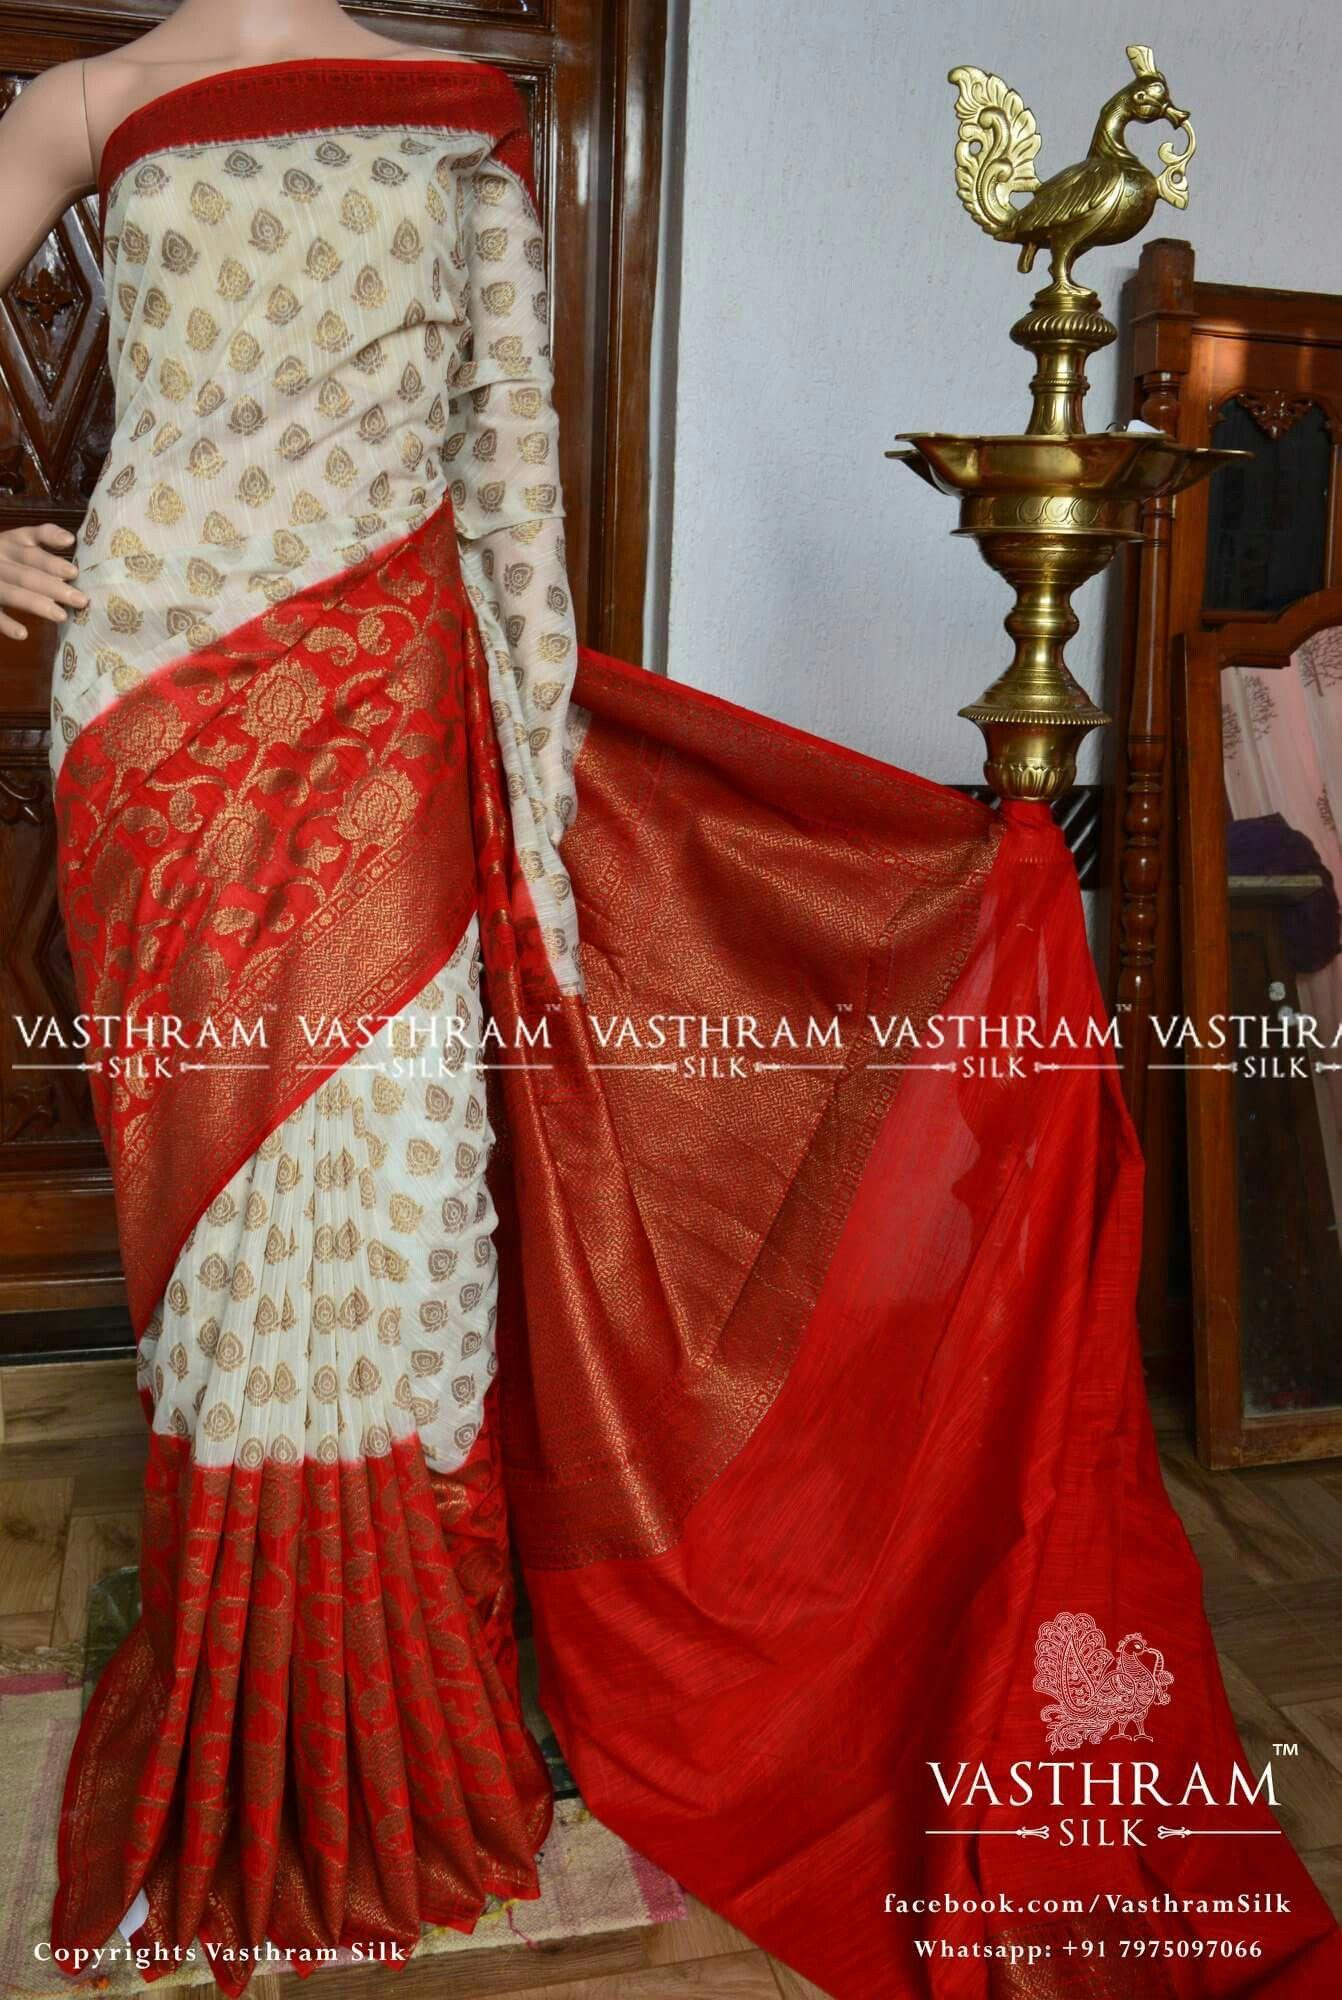 Banarasi dupion silk Cost 4100 inr Whatsapp 91